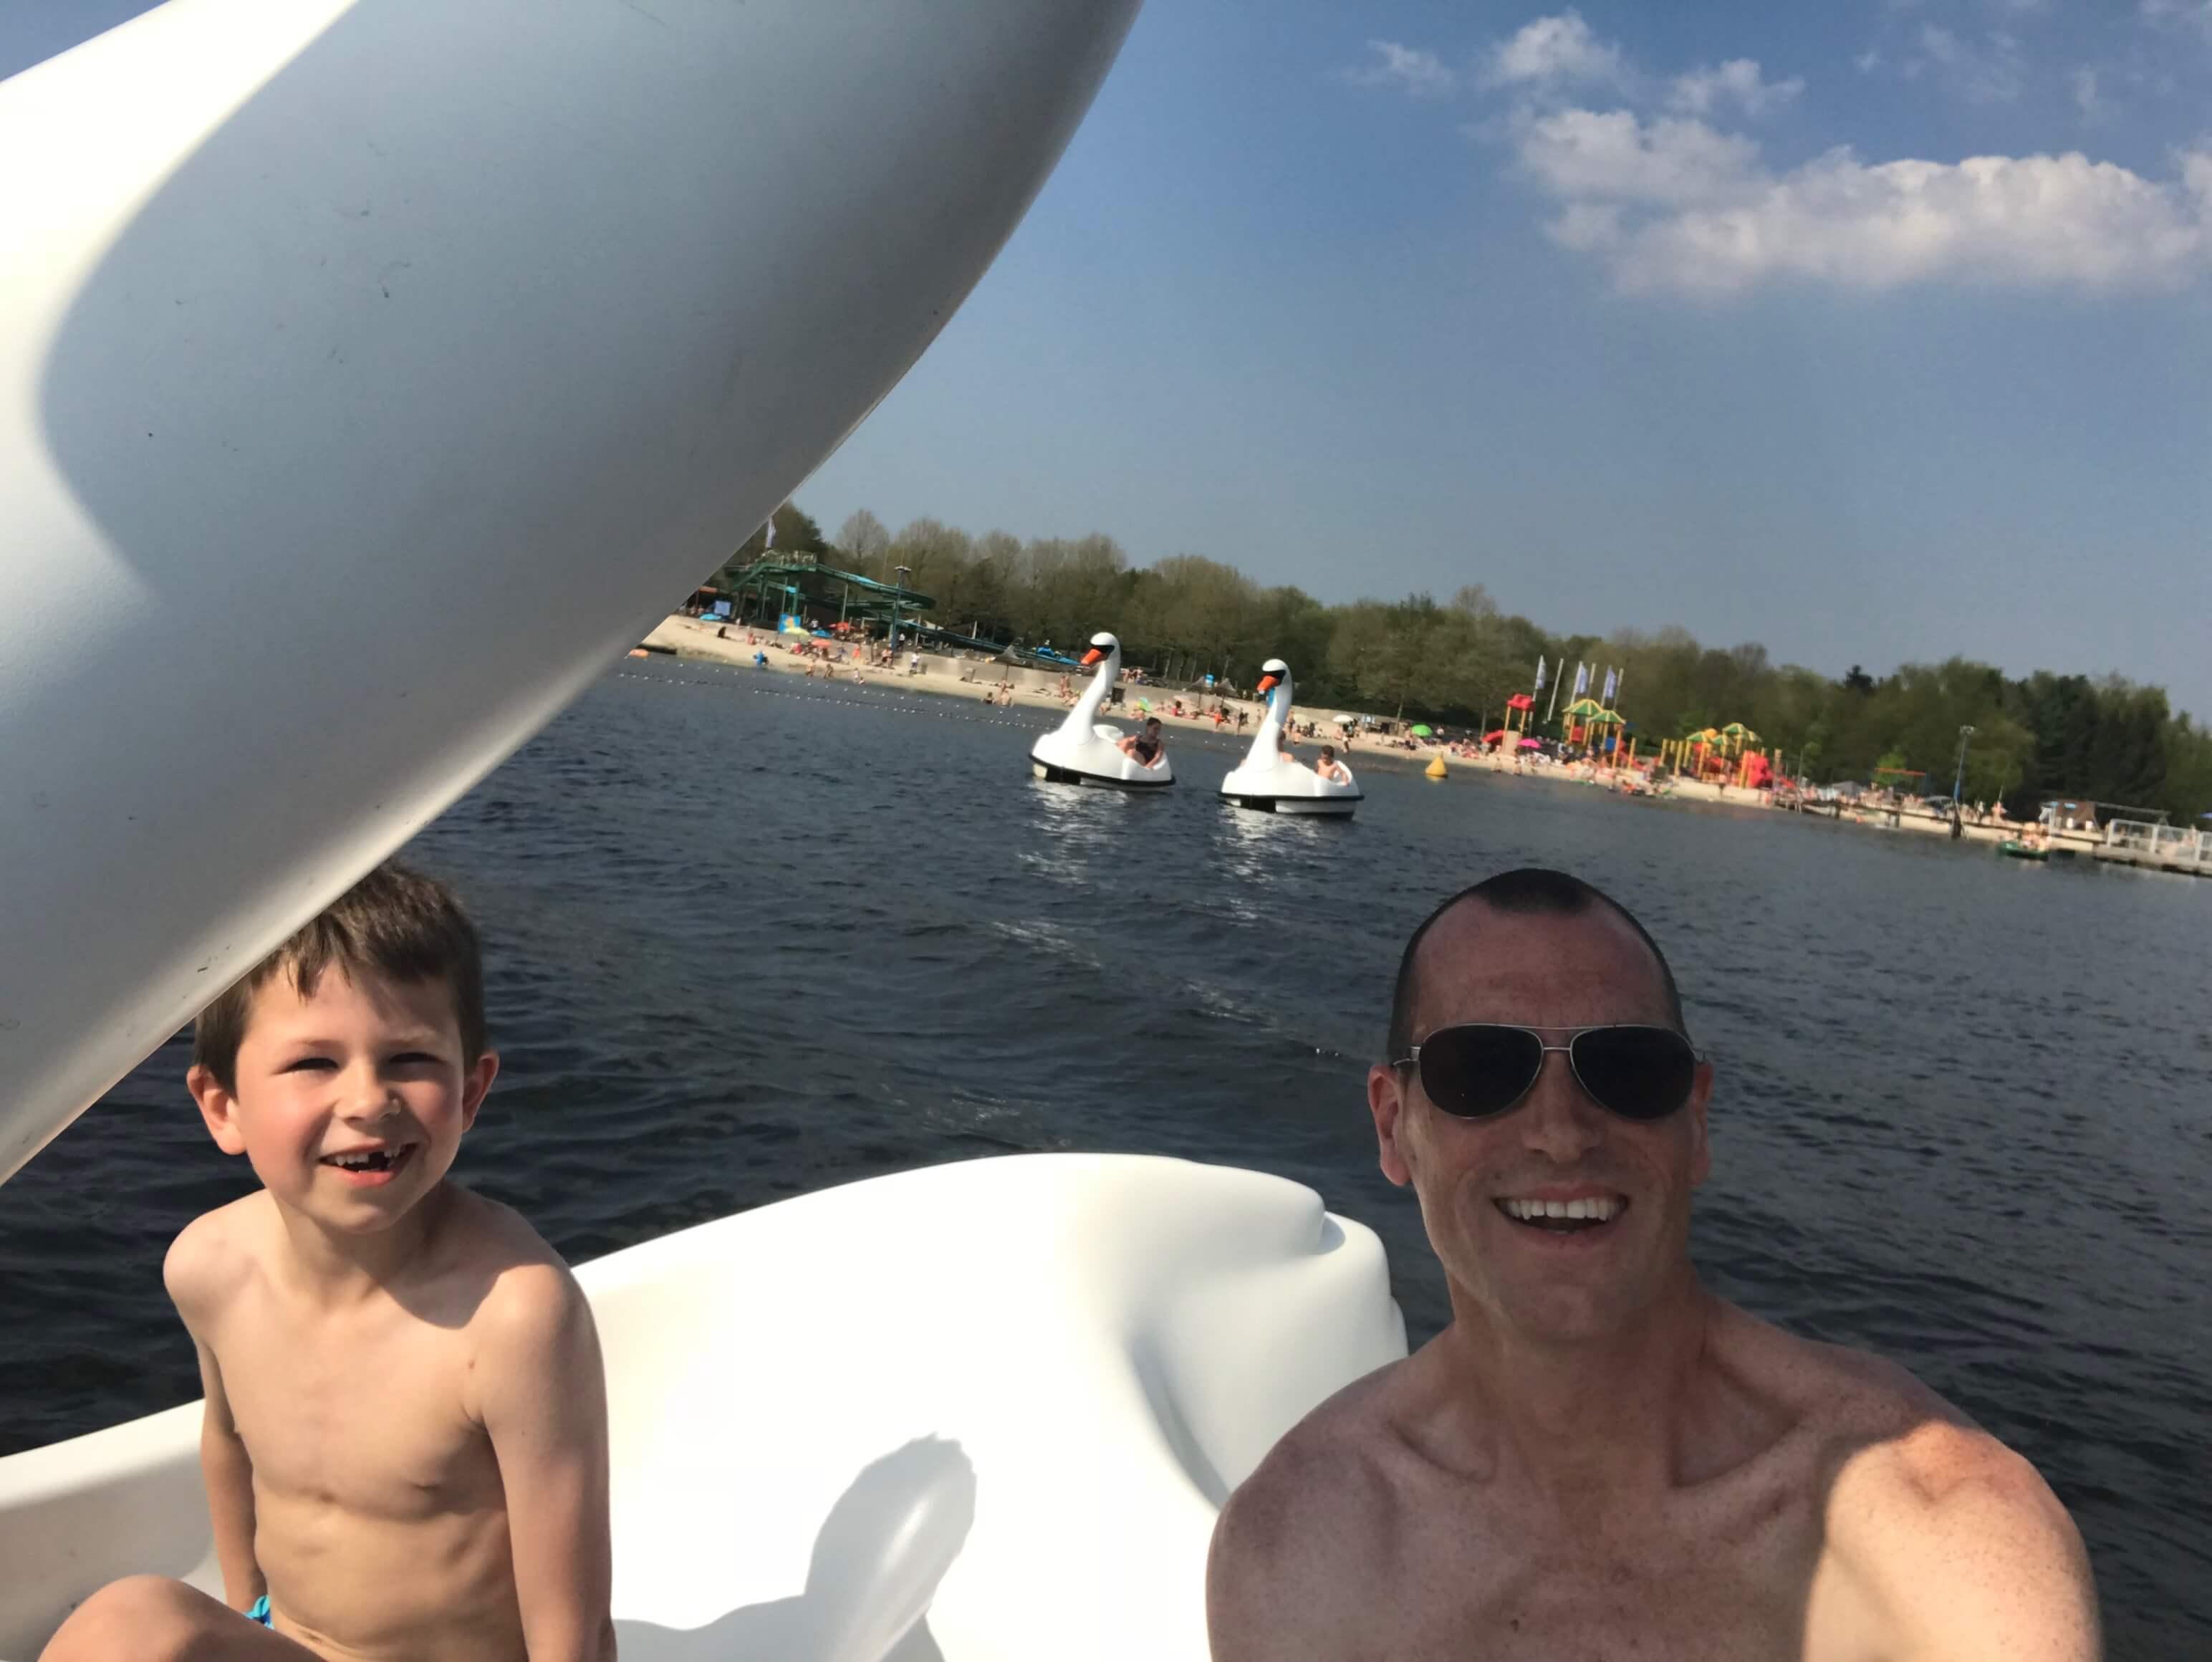 Waterfiets in speelland Beekse Bergen